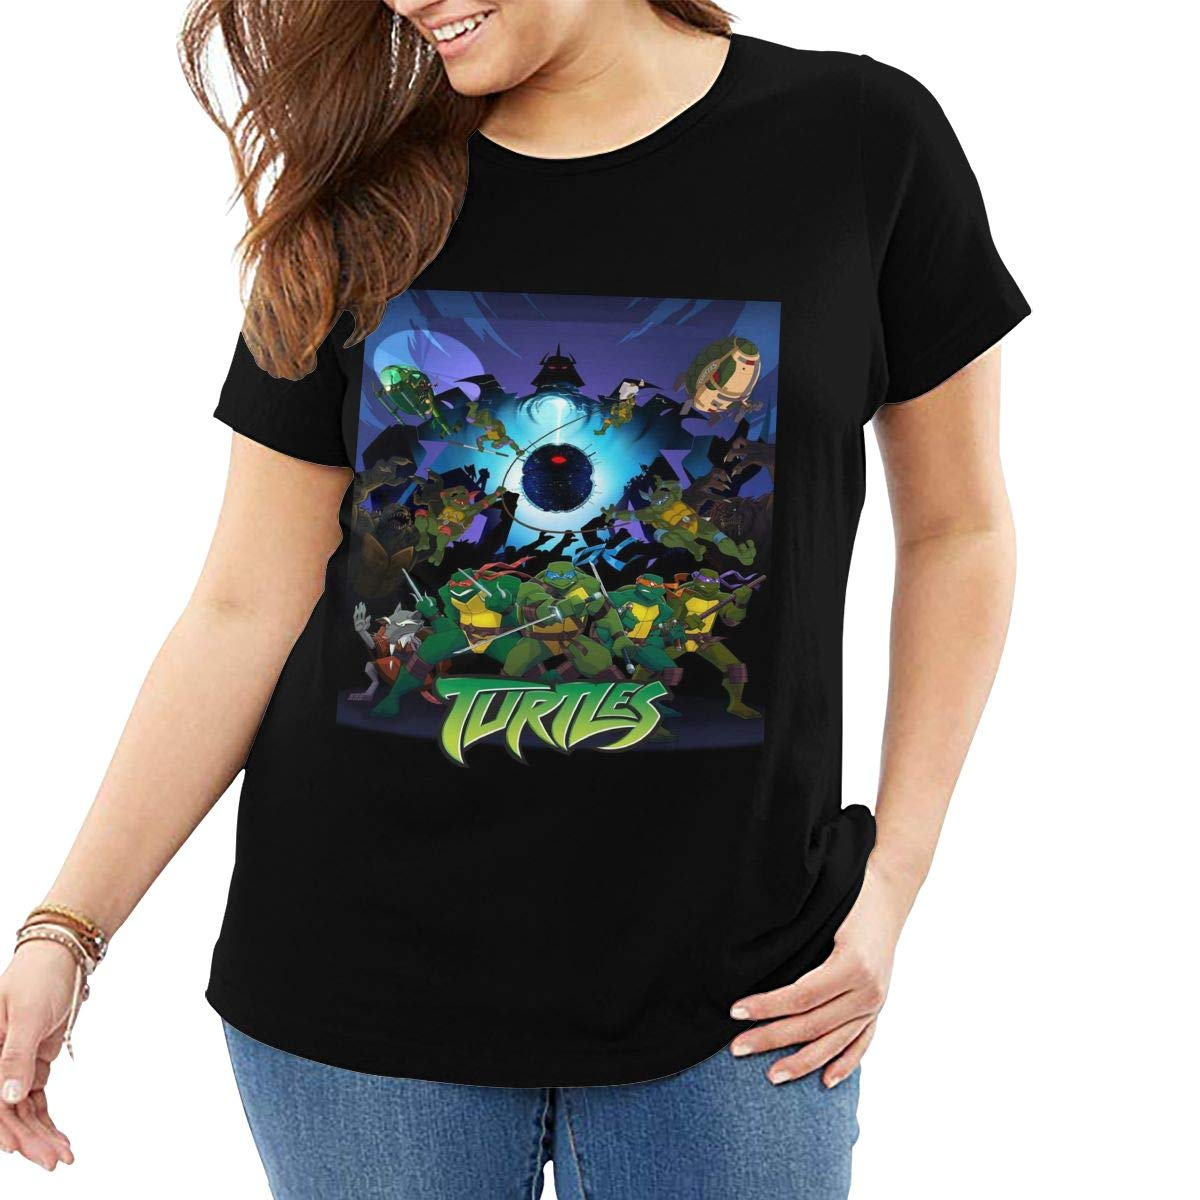 Teenage Mutant Ninja Turtles Women's Plus Size Short Sleeve Button T Shirt